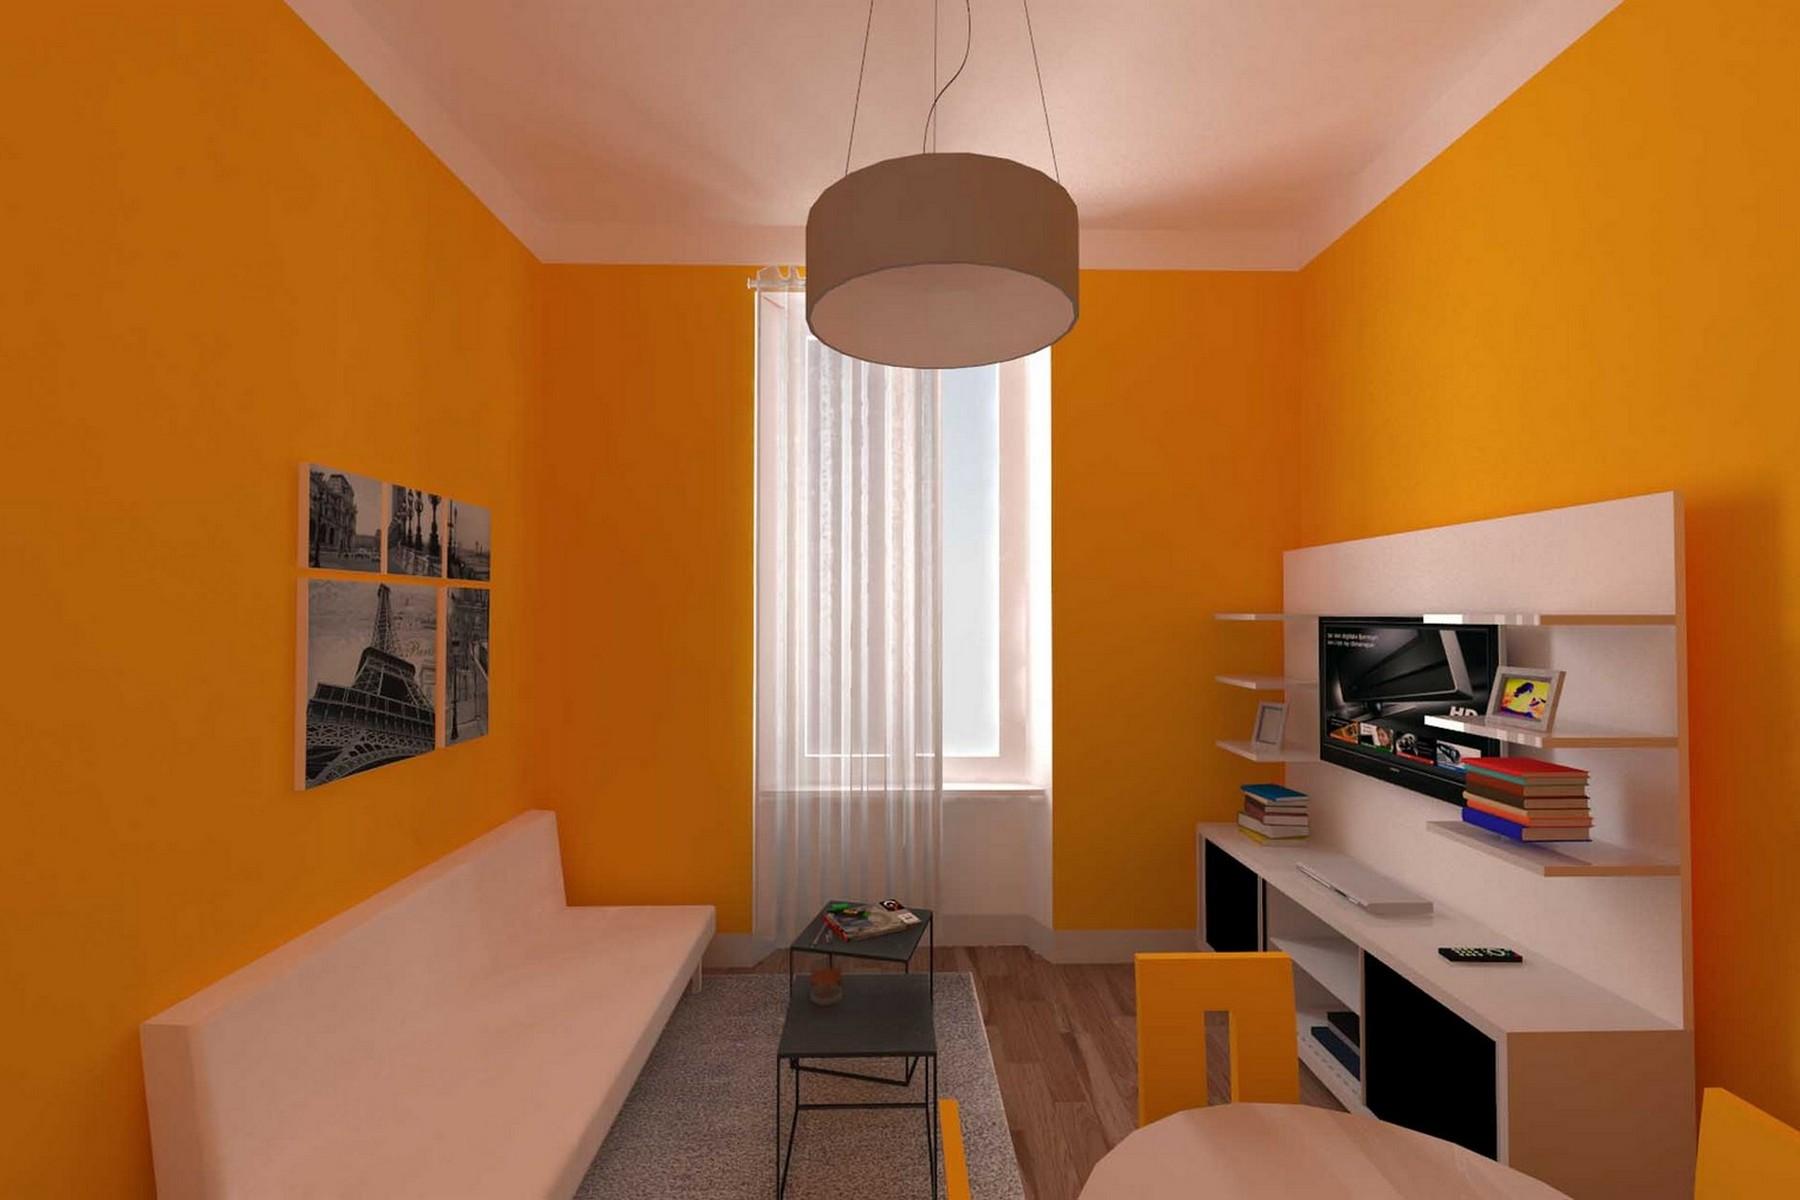 Single Family Home for Sale at elegant apartment in historic building Corso Peschiera Torino, Turin 10138 Italy